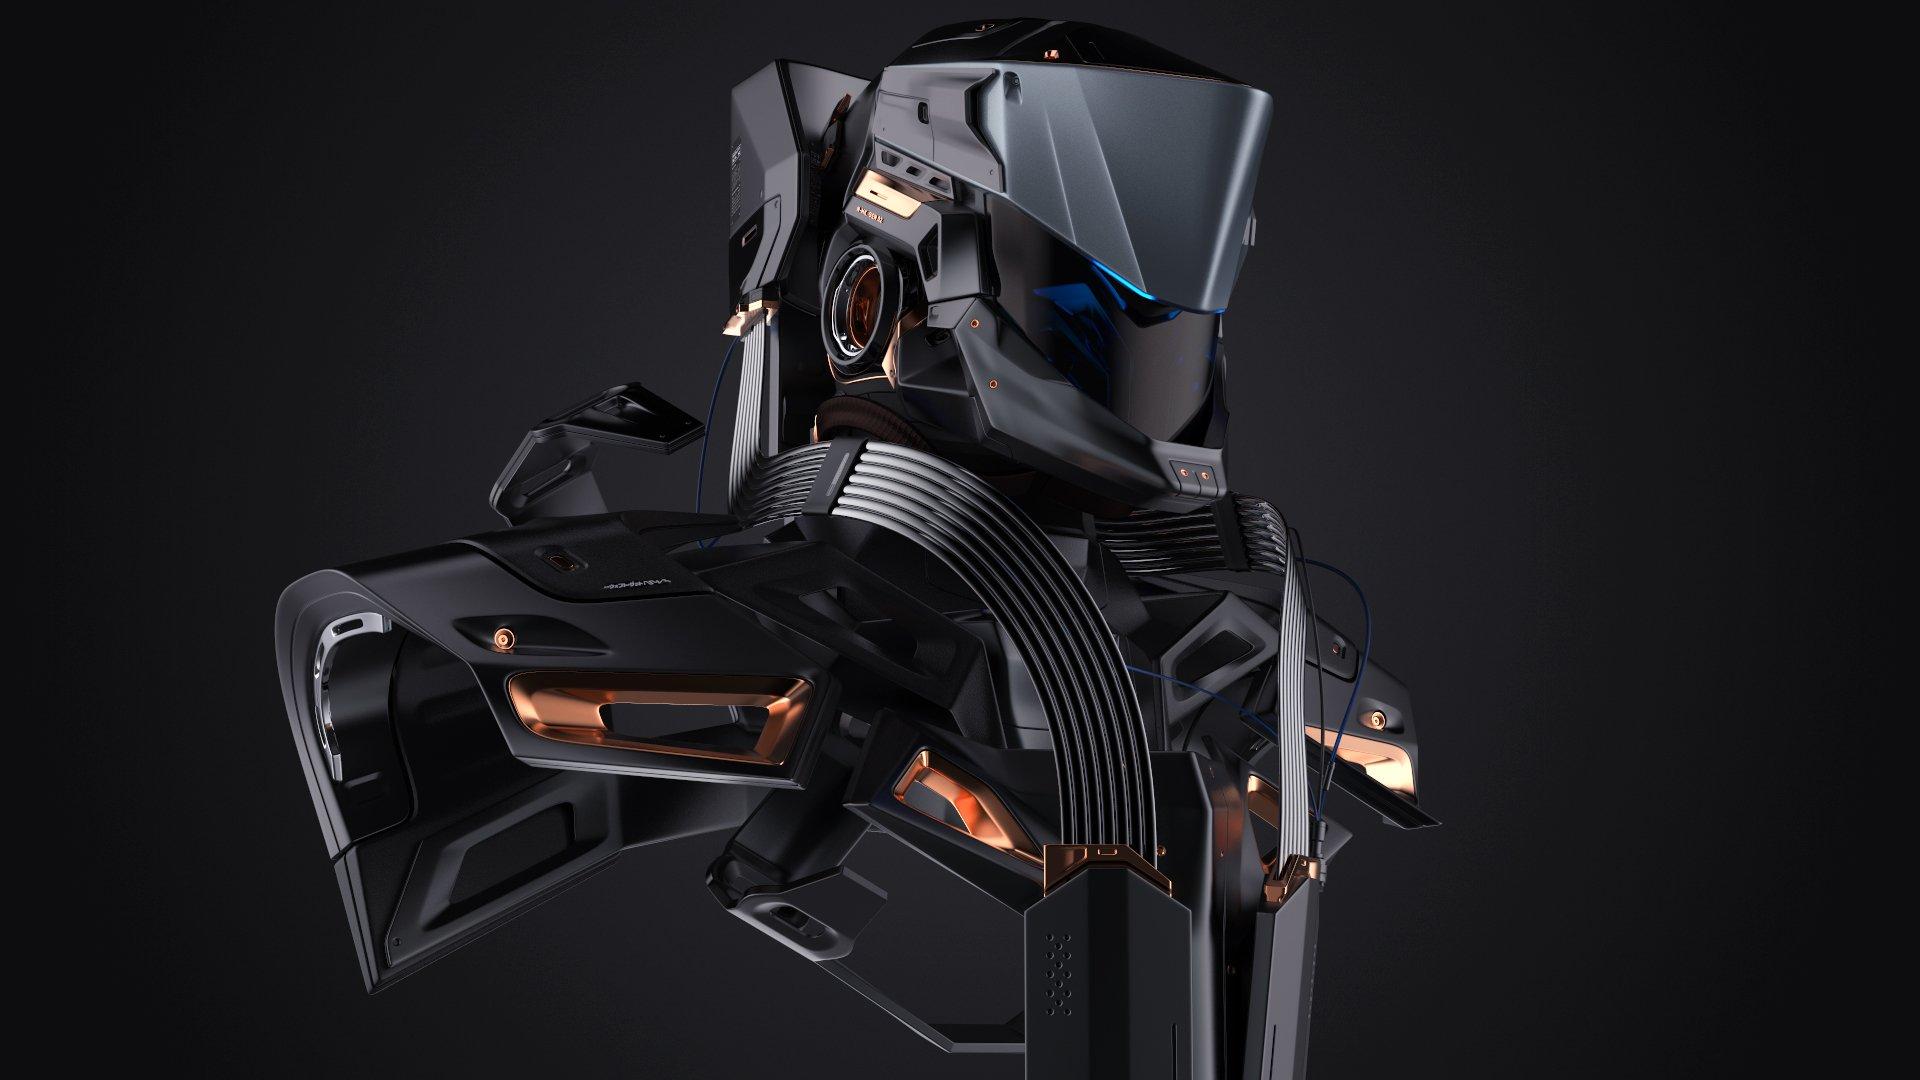 3D Modeling in Maya - Robotic Design